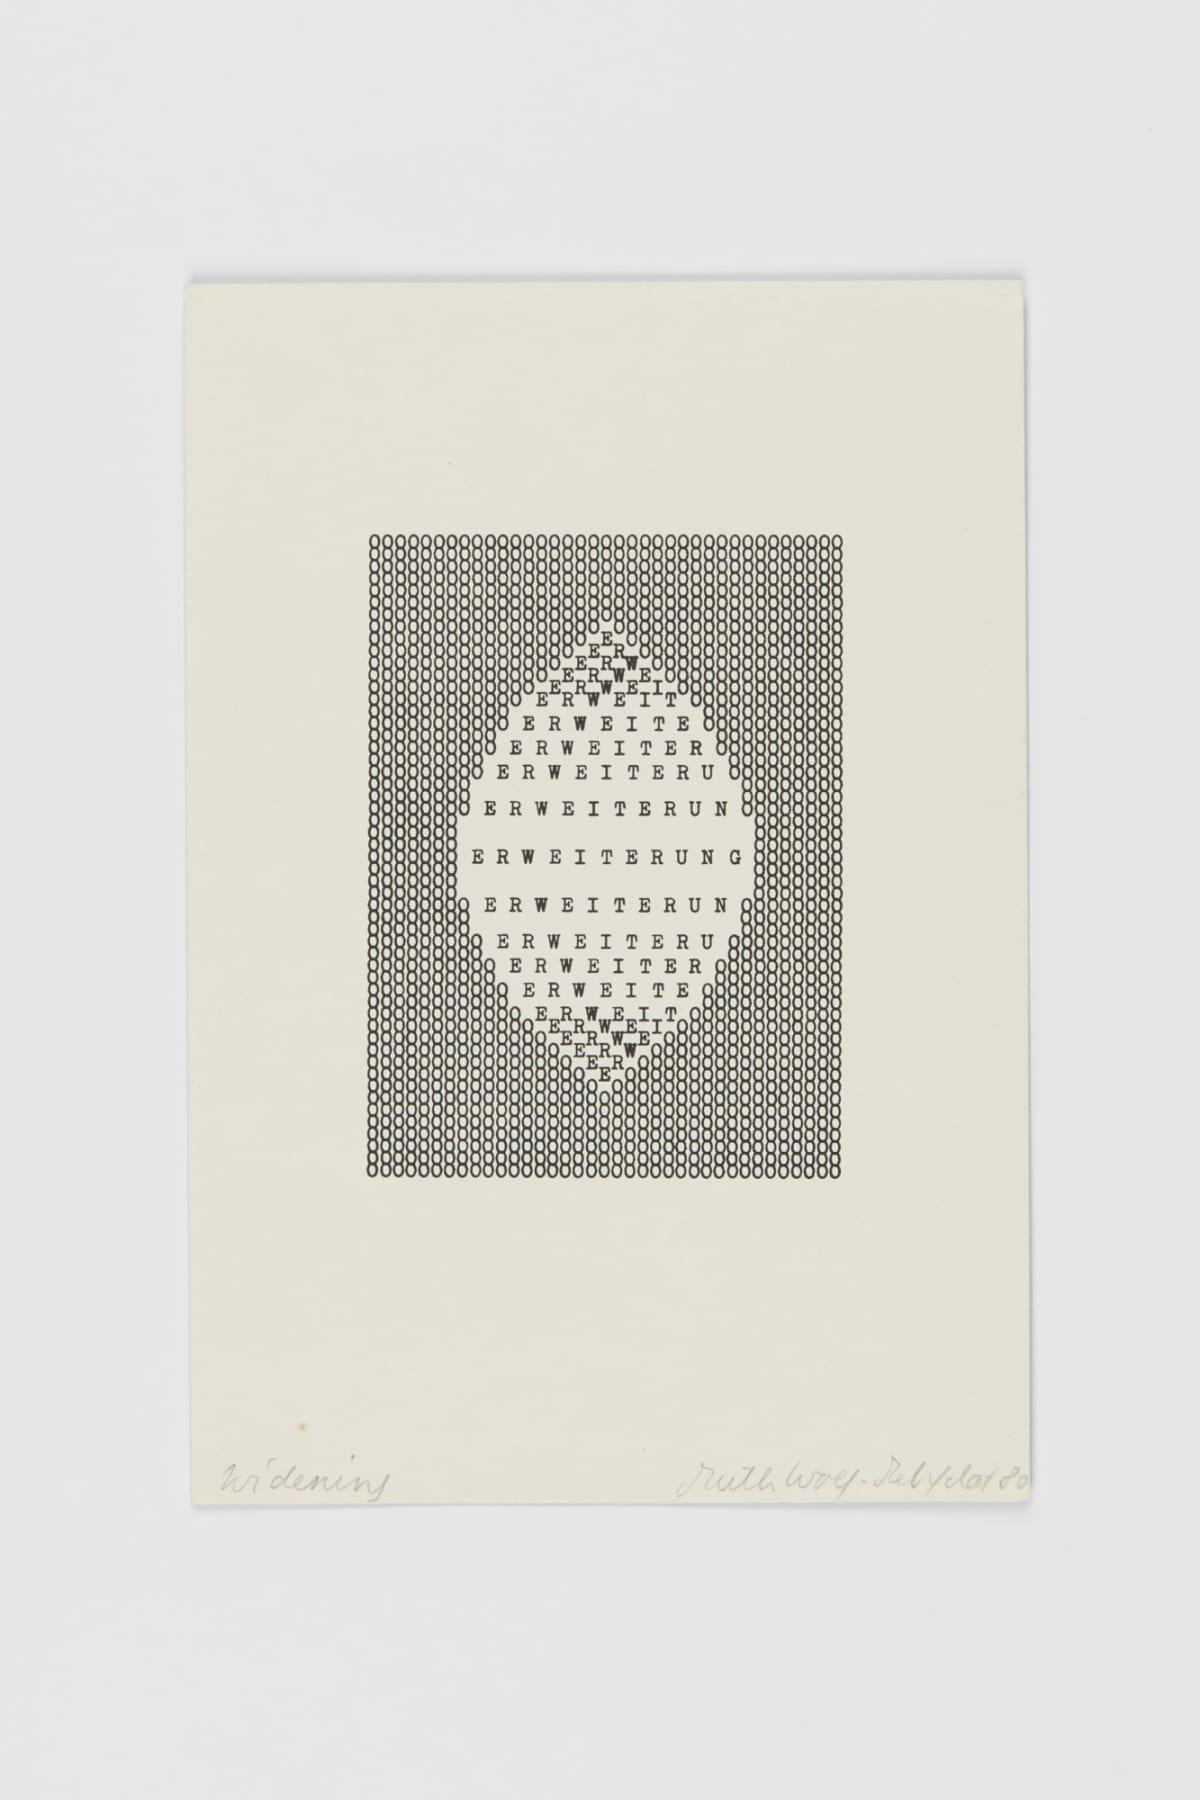 Ruth WOLF-REHFELDT Widening, 1980 print (zinc lithograph) 21.6 x 14.8 cm